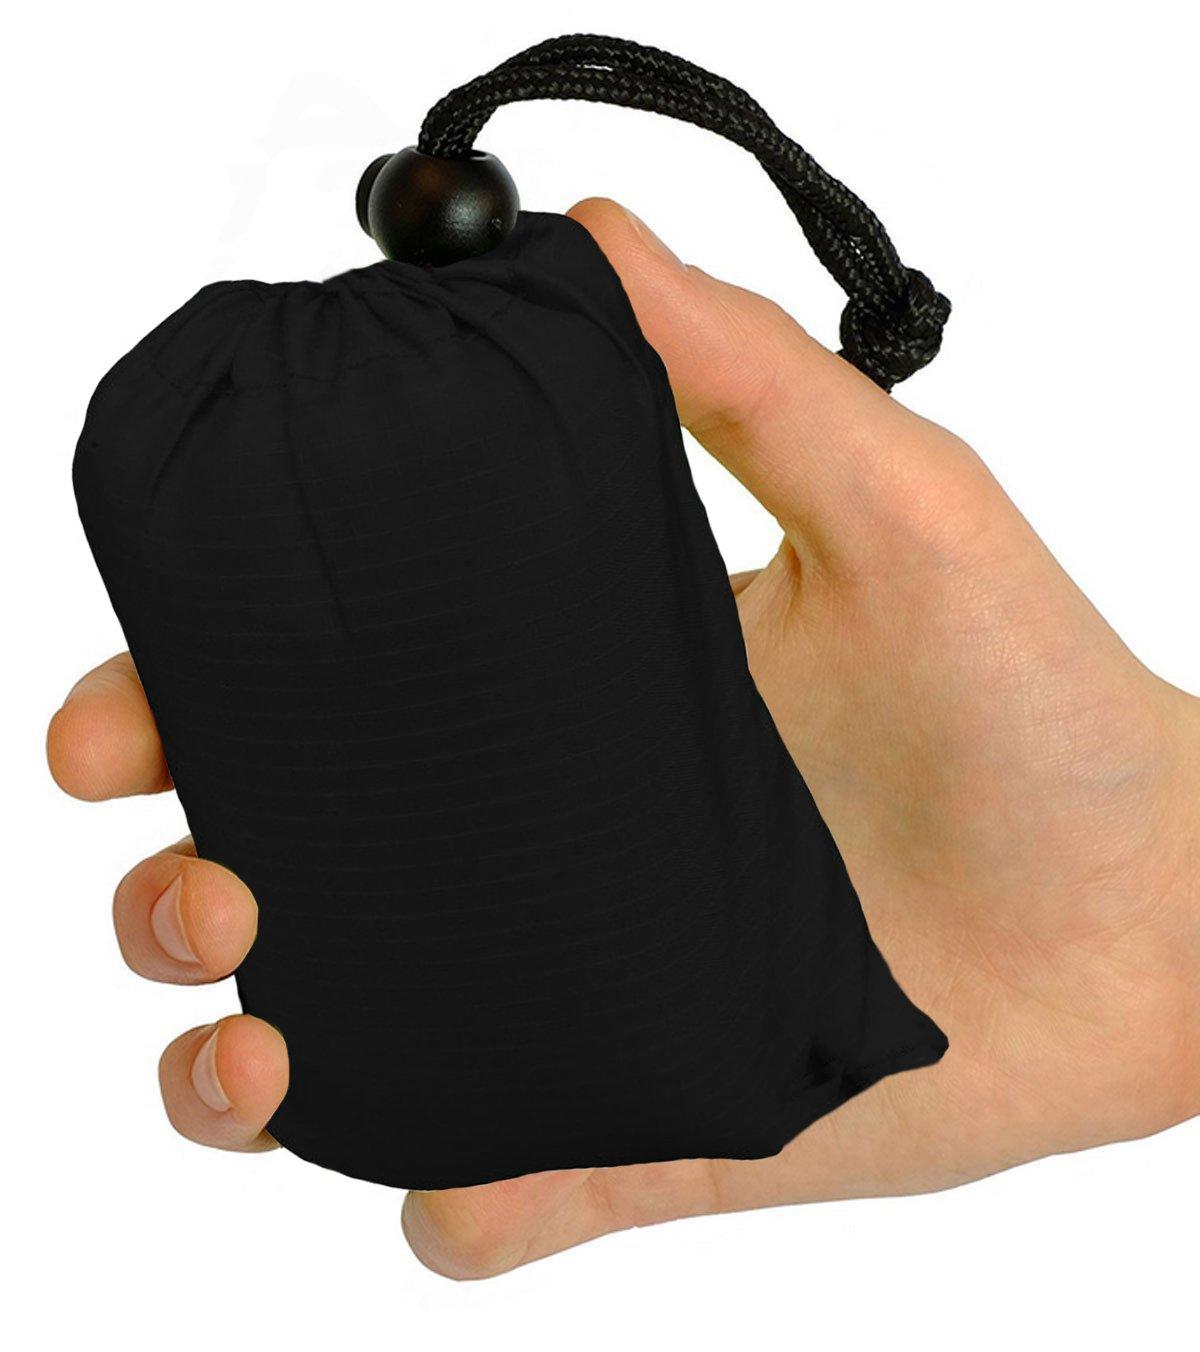 biaozhi tamaño de bolsillo resistente al agua manta de Picnic manta de camping ligero, bolsillo para al aire libre Camping, viaje, senderismo, Picnic, rojo